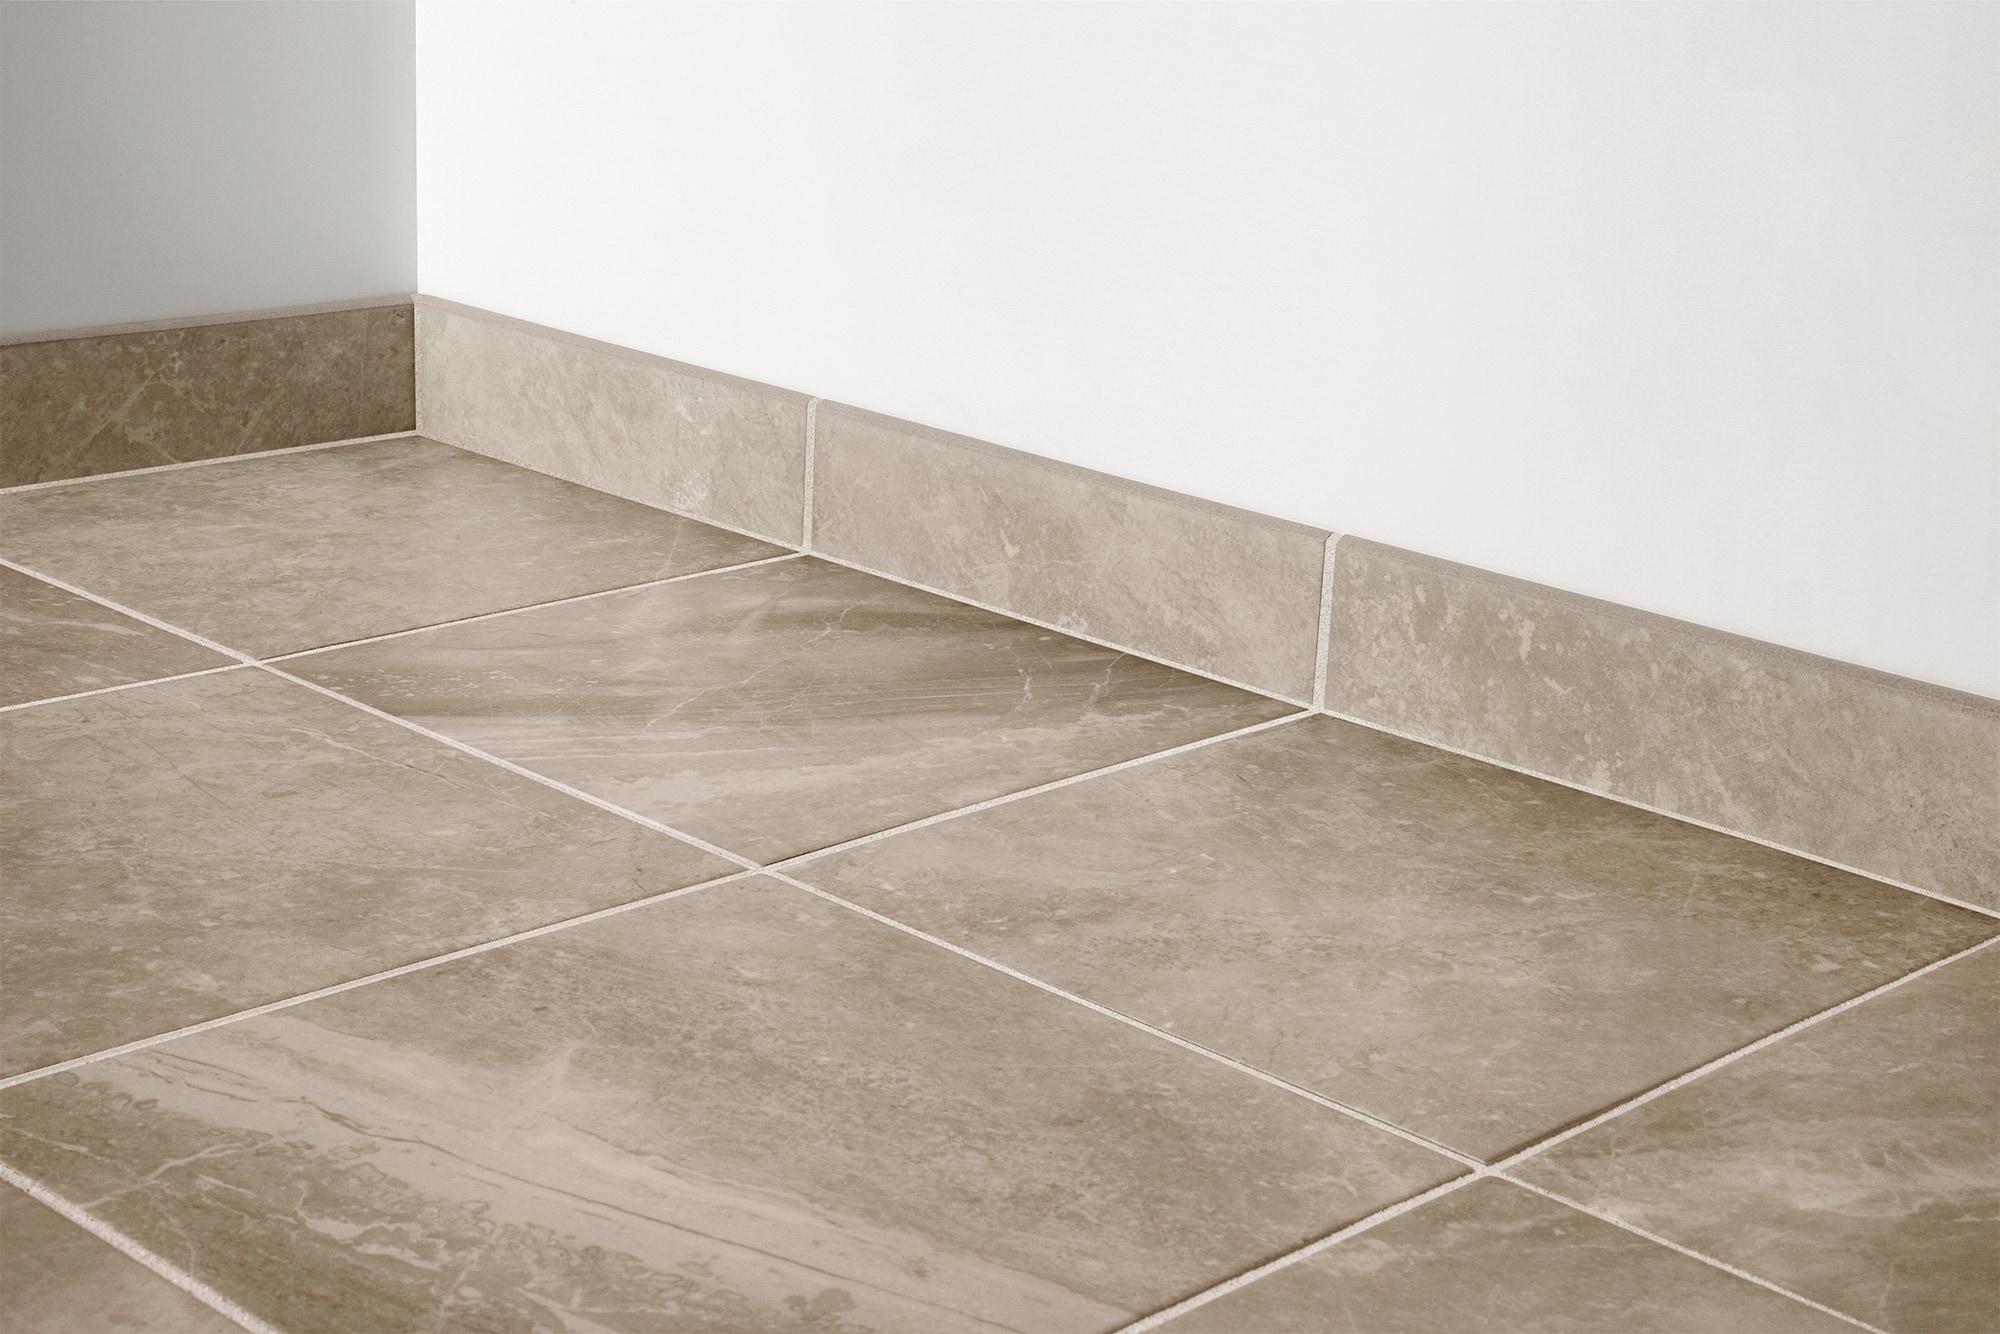 Brown / 3x12 - Bullnose / Matte Porcelain Tile - Desire Series 0